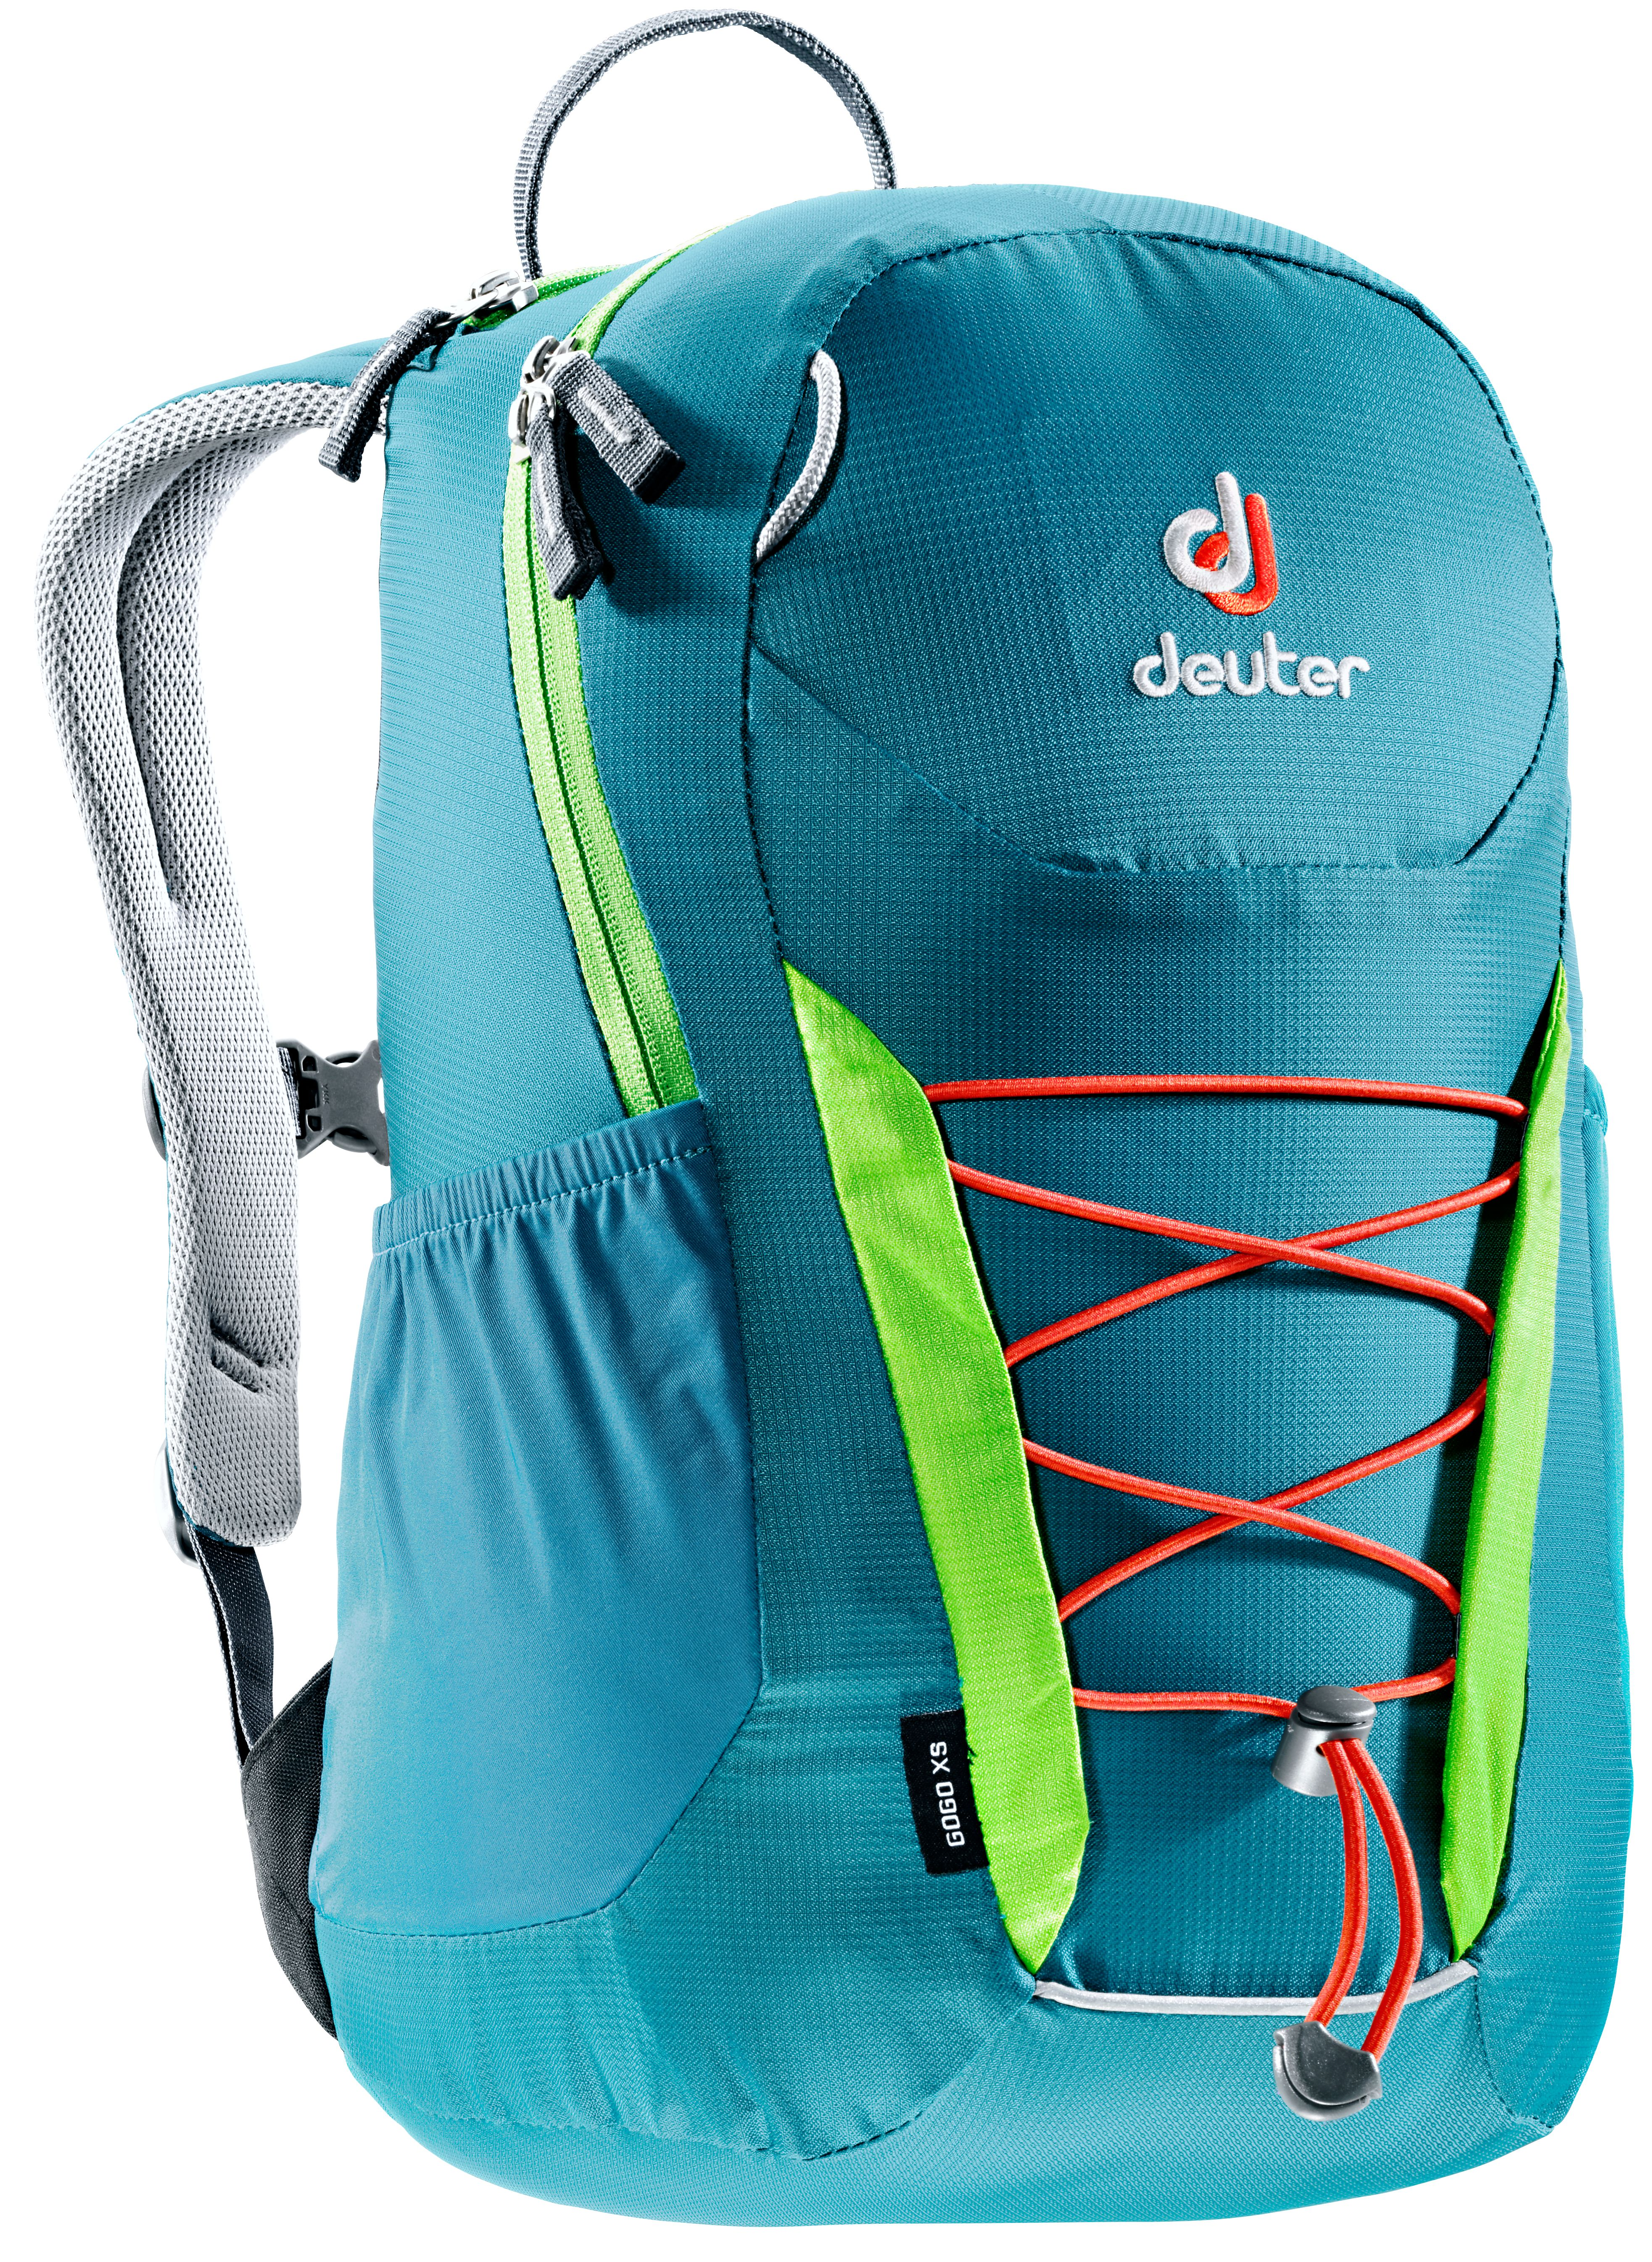 b01c22aa2d Deuter Gogo XS. Deuter Gogo XS. Junior je volnočasový batoh pro děti ...